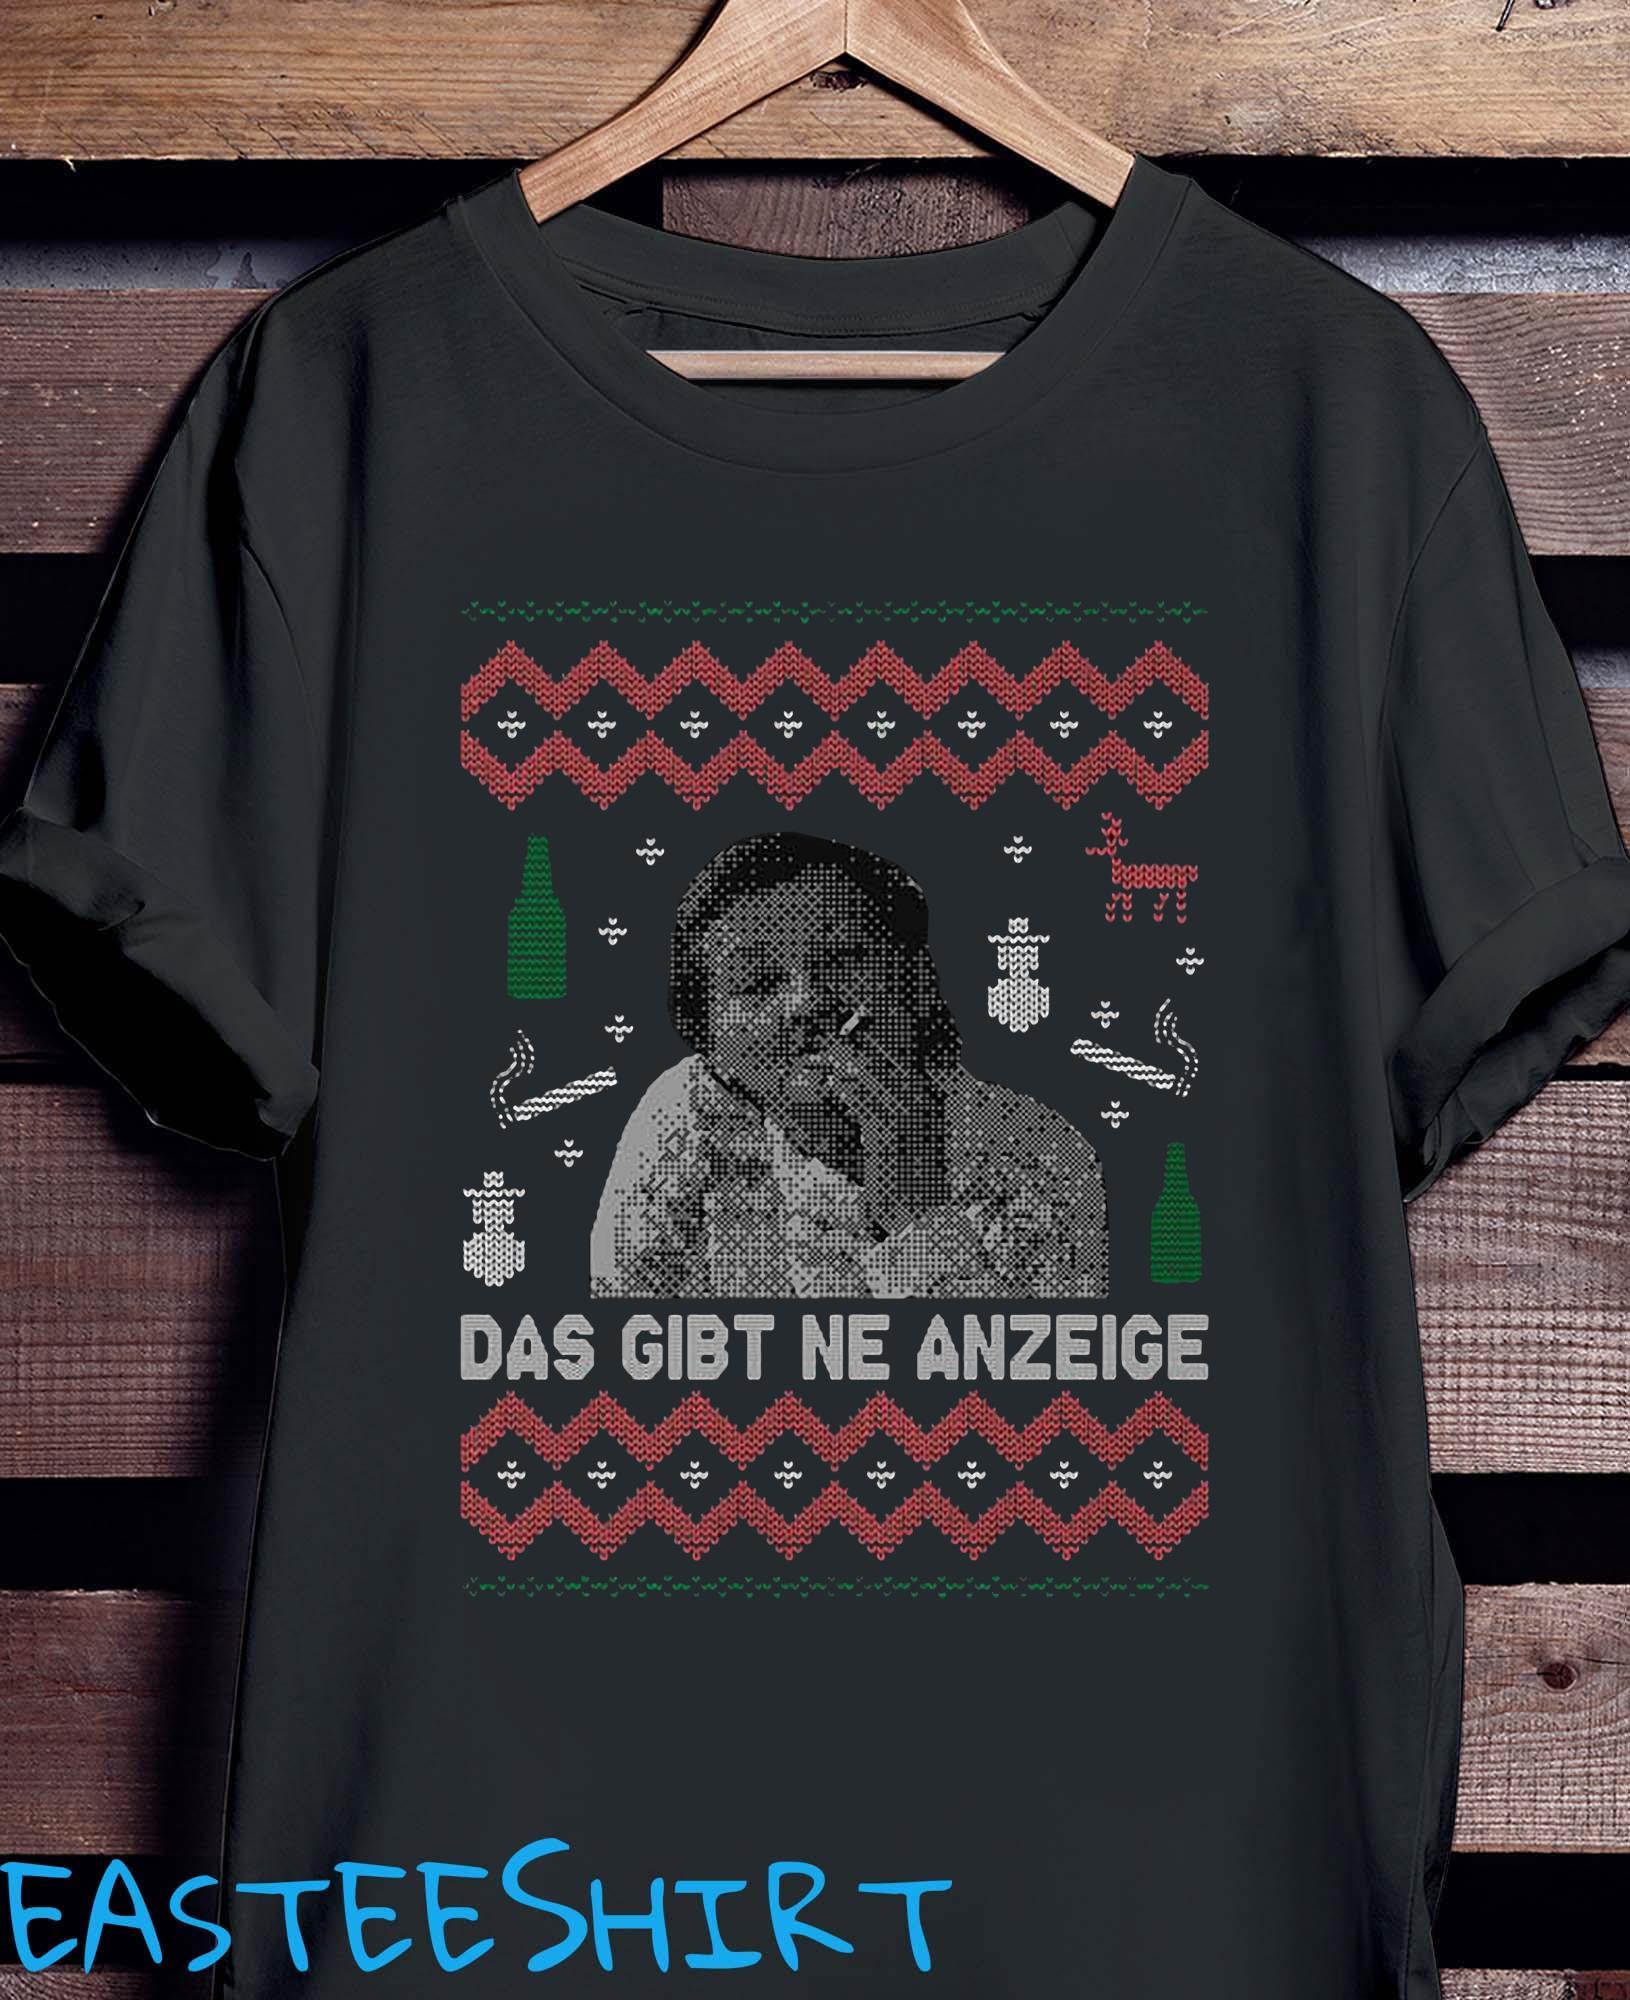 Das Gibt Ne Anzeige Ugly Christmas Sweater